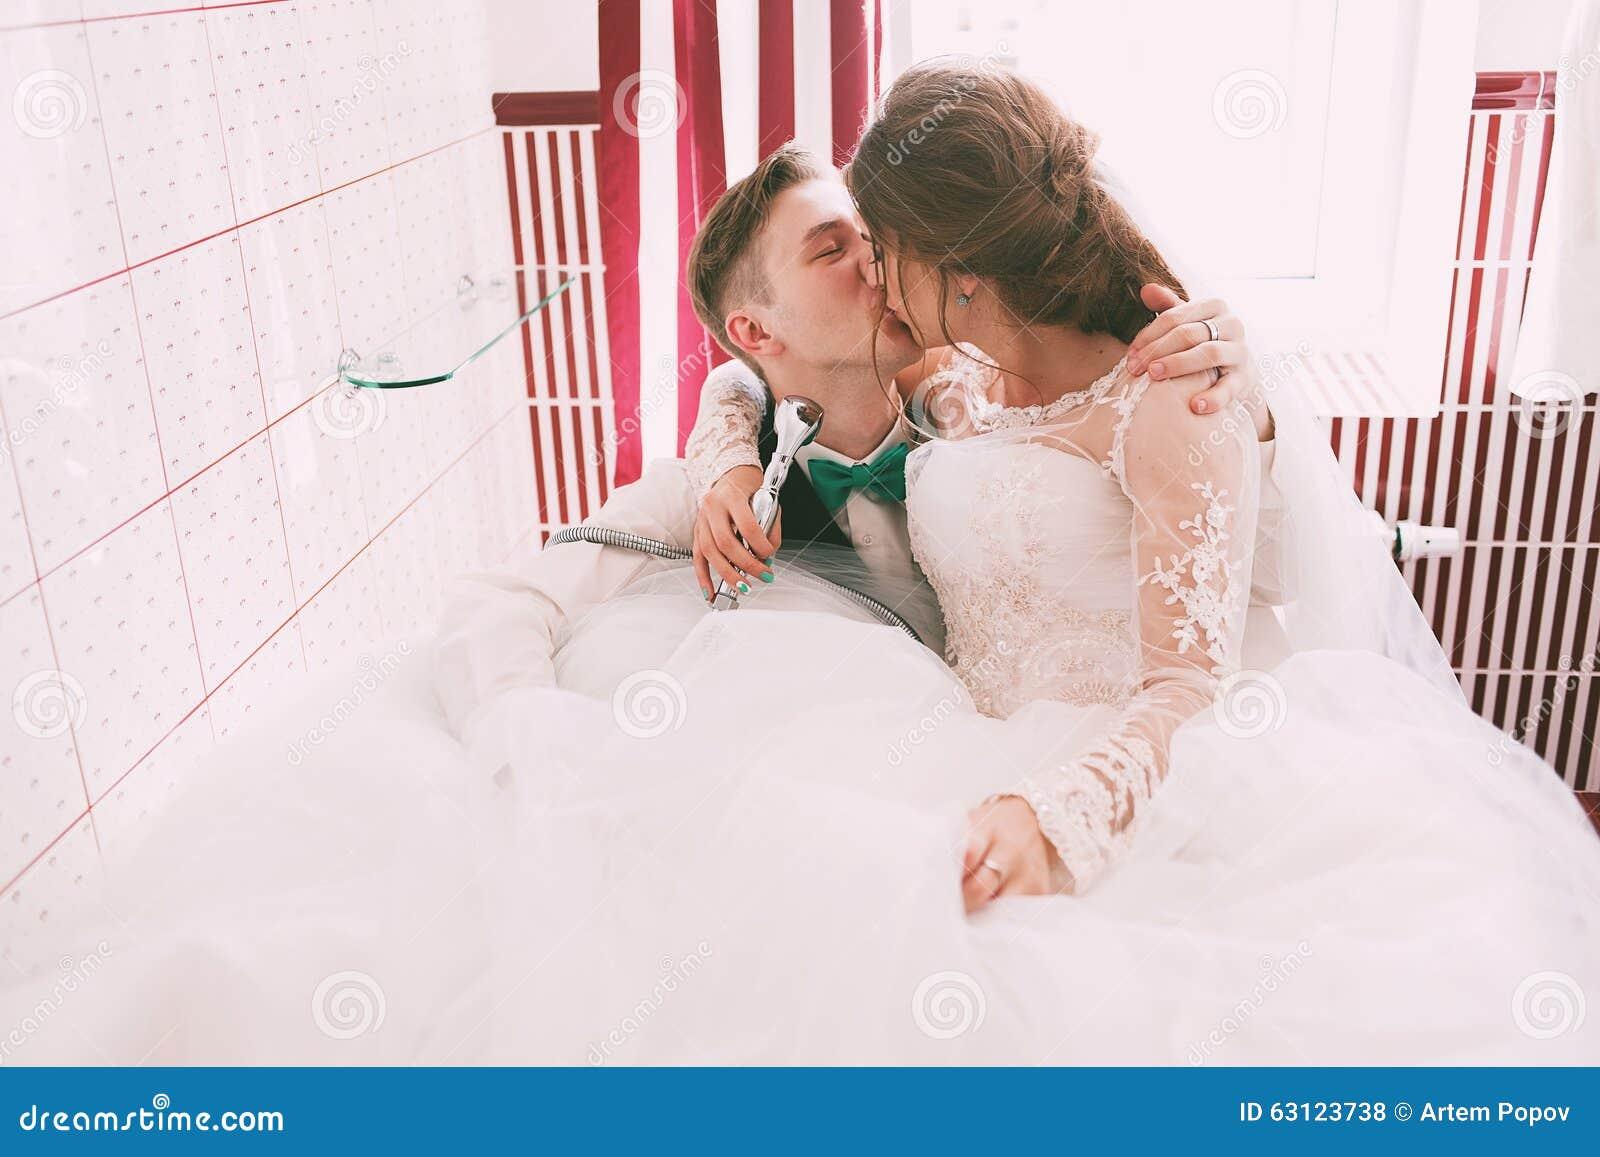 Kissing Bride And Groom Having Fun In Bathroom Stock Photo